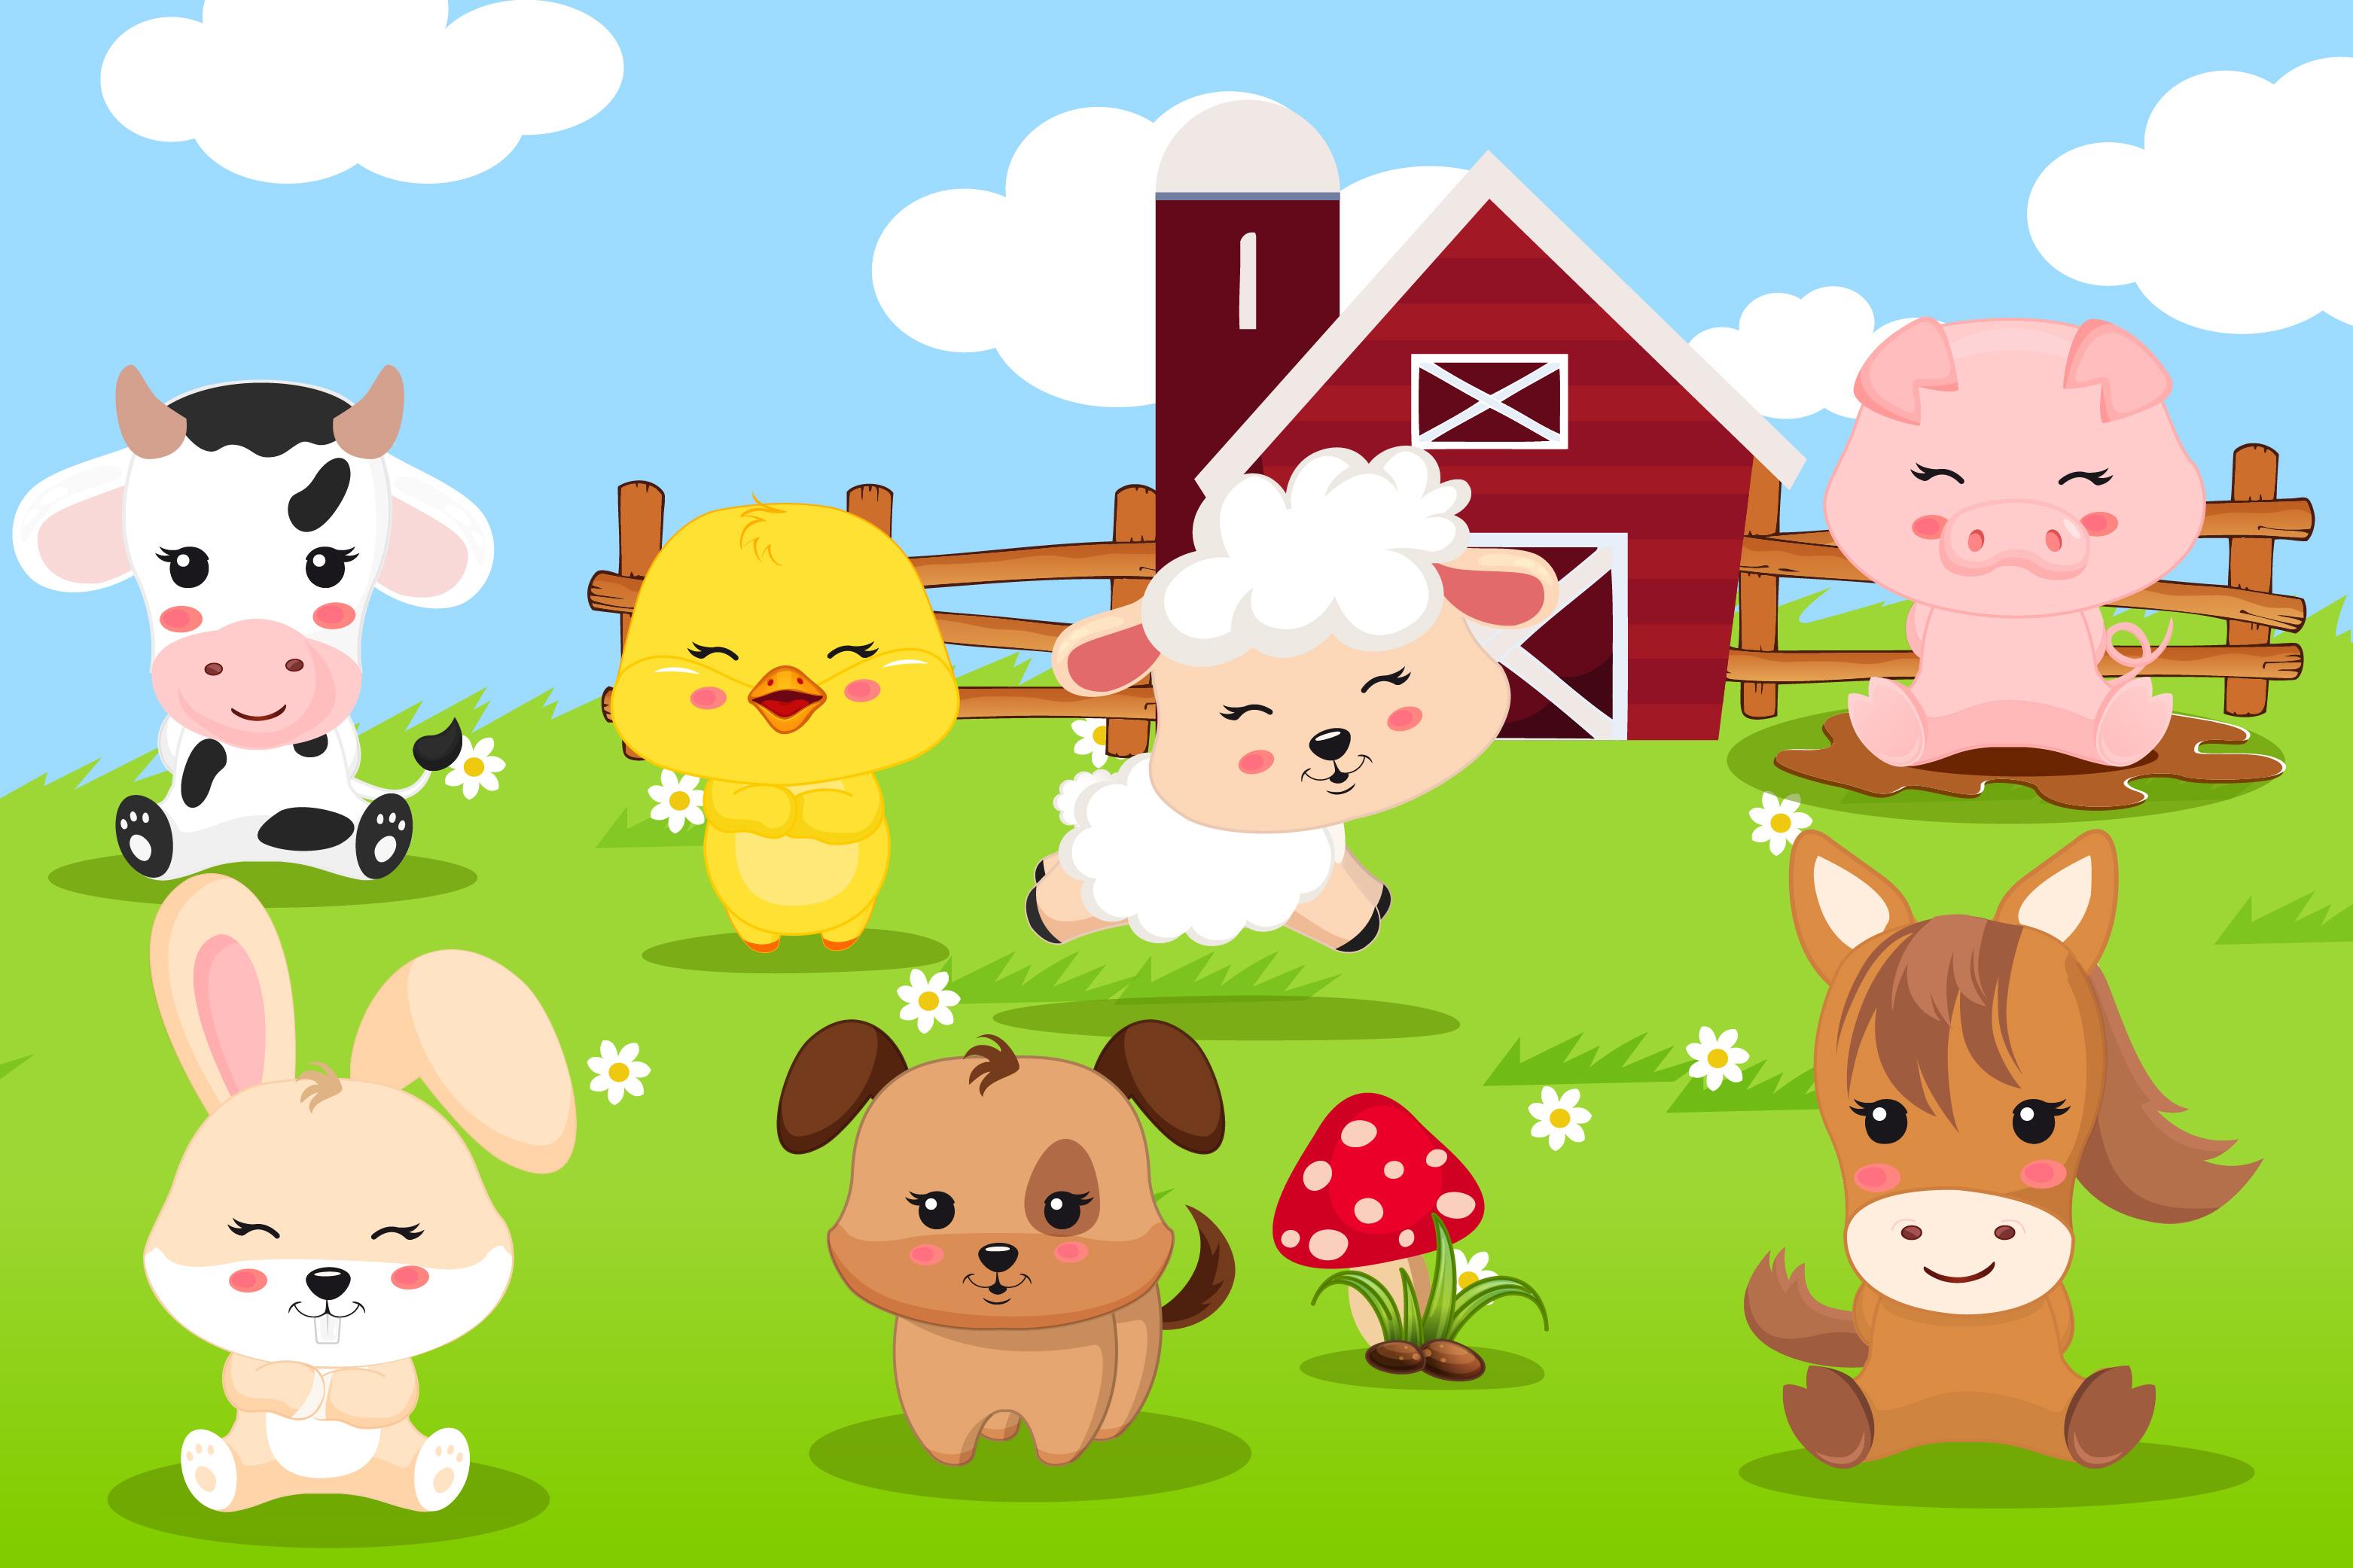 Farm animal clipart, Farm animal graphics (28215 ...